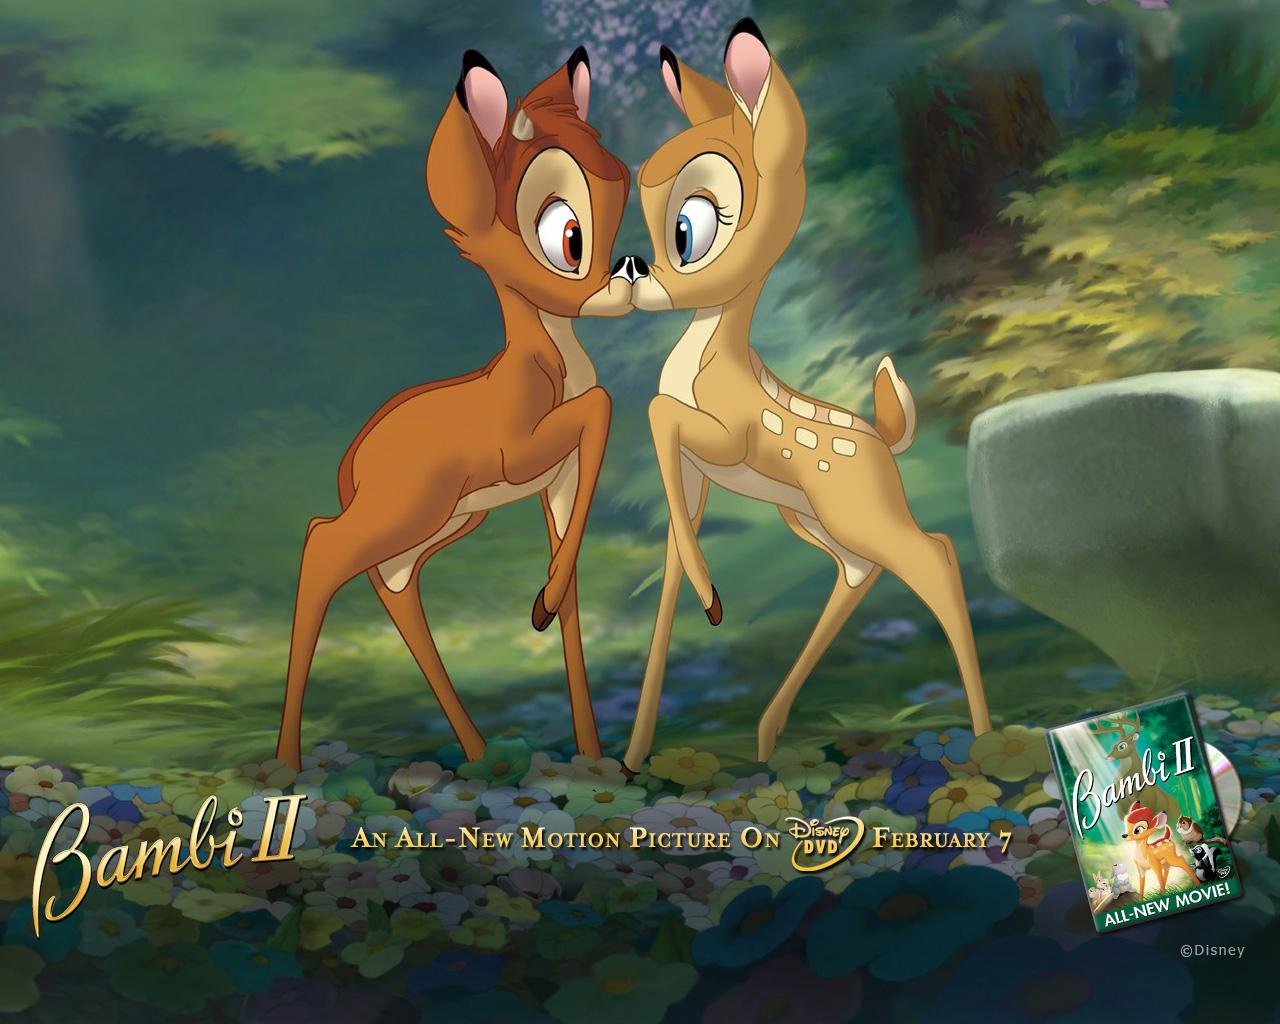 http://4.bp.blogspot.com/-emLFWajlRyo/Tj_ZRQW9FWI/AAAAAAAAAC4/_B5UP8r-TaI/s1600/Bambi-Wallpapers-2.jpg